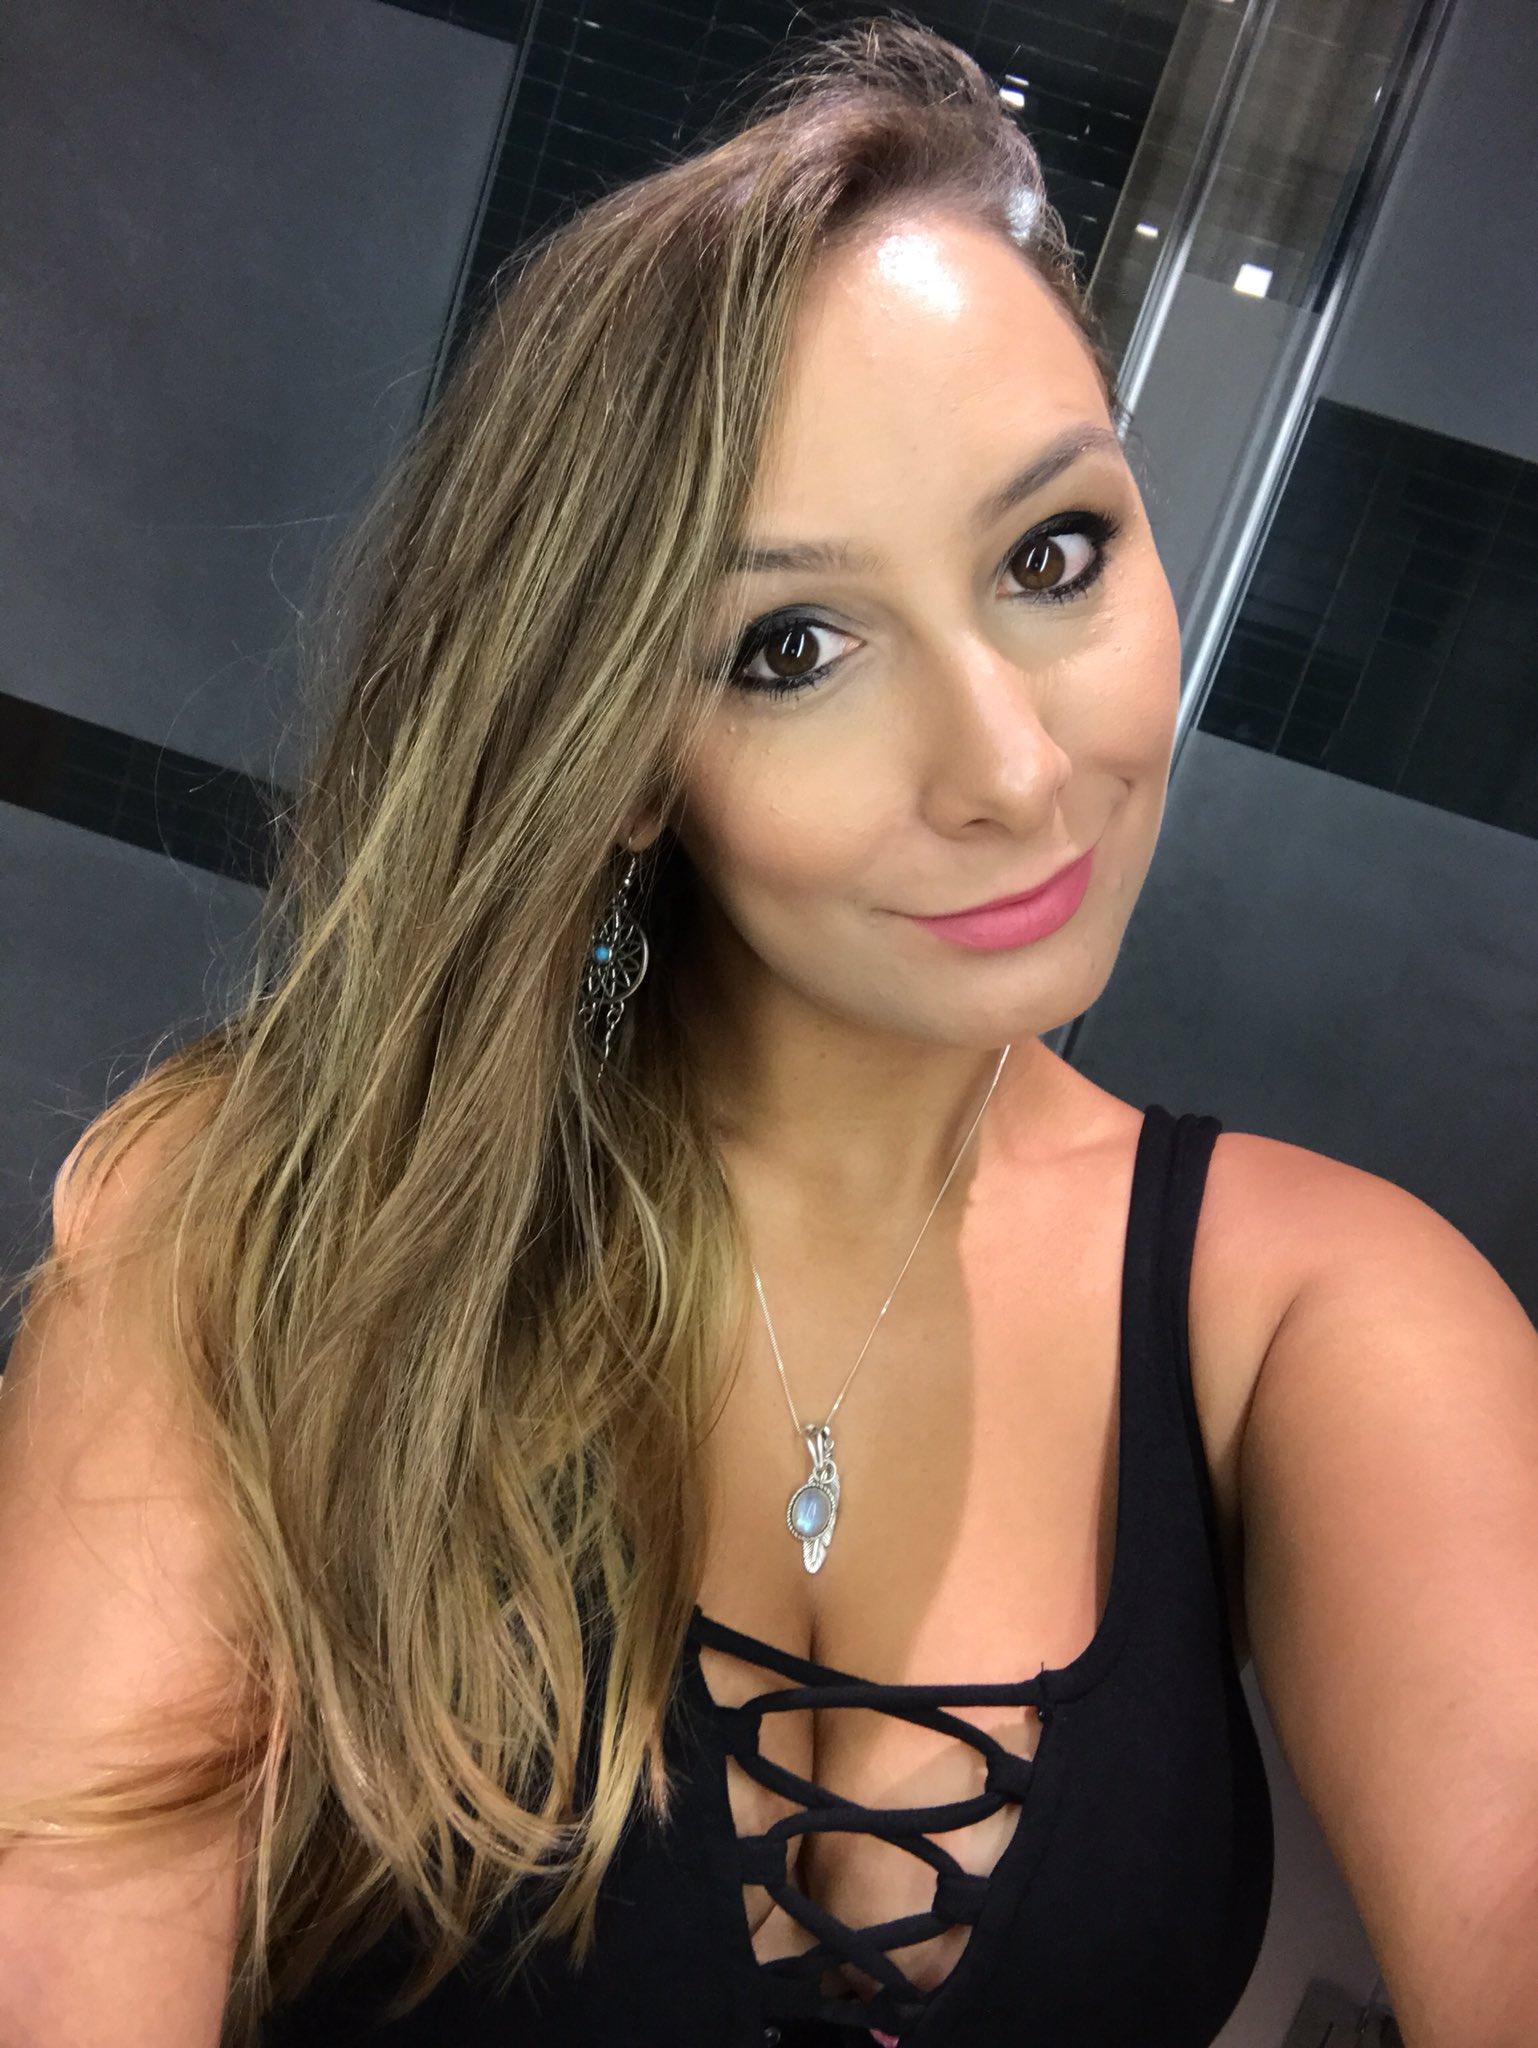 TW Pornstars - Mariah Leonne. Twitter. Bye bye Miami 😭💖. 8